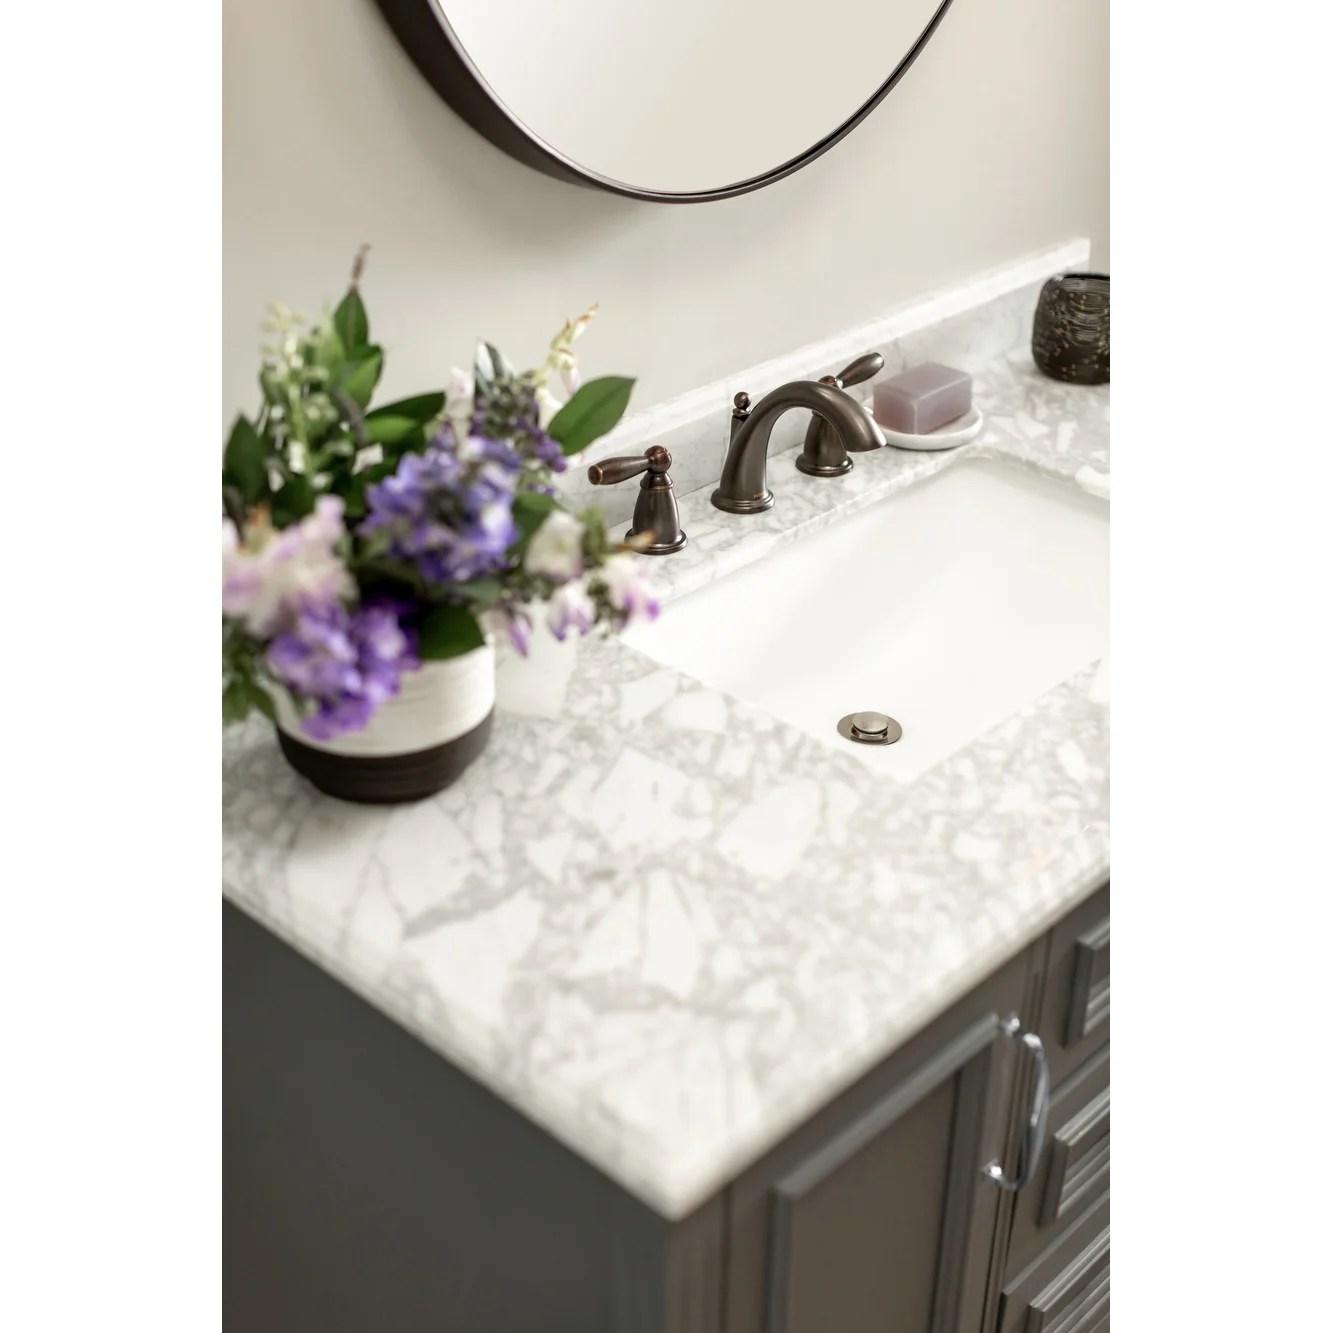 moen t6620 brantford 1 2 gpm widespread bathroom faucet